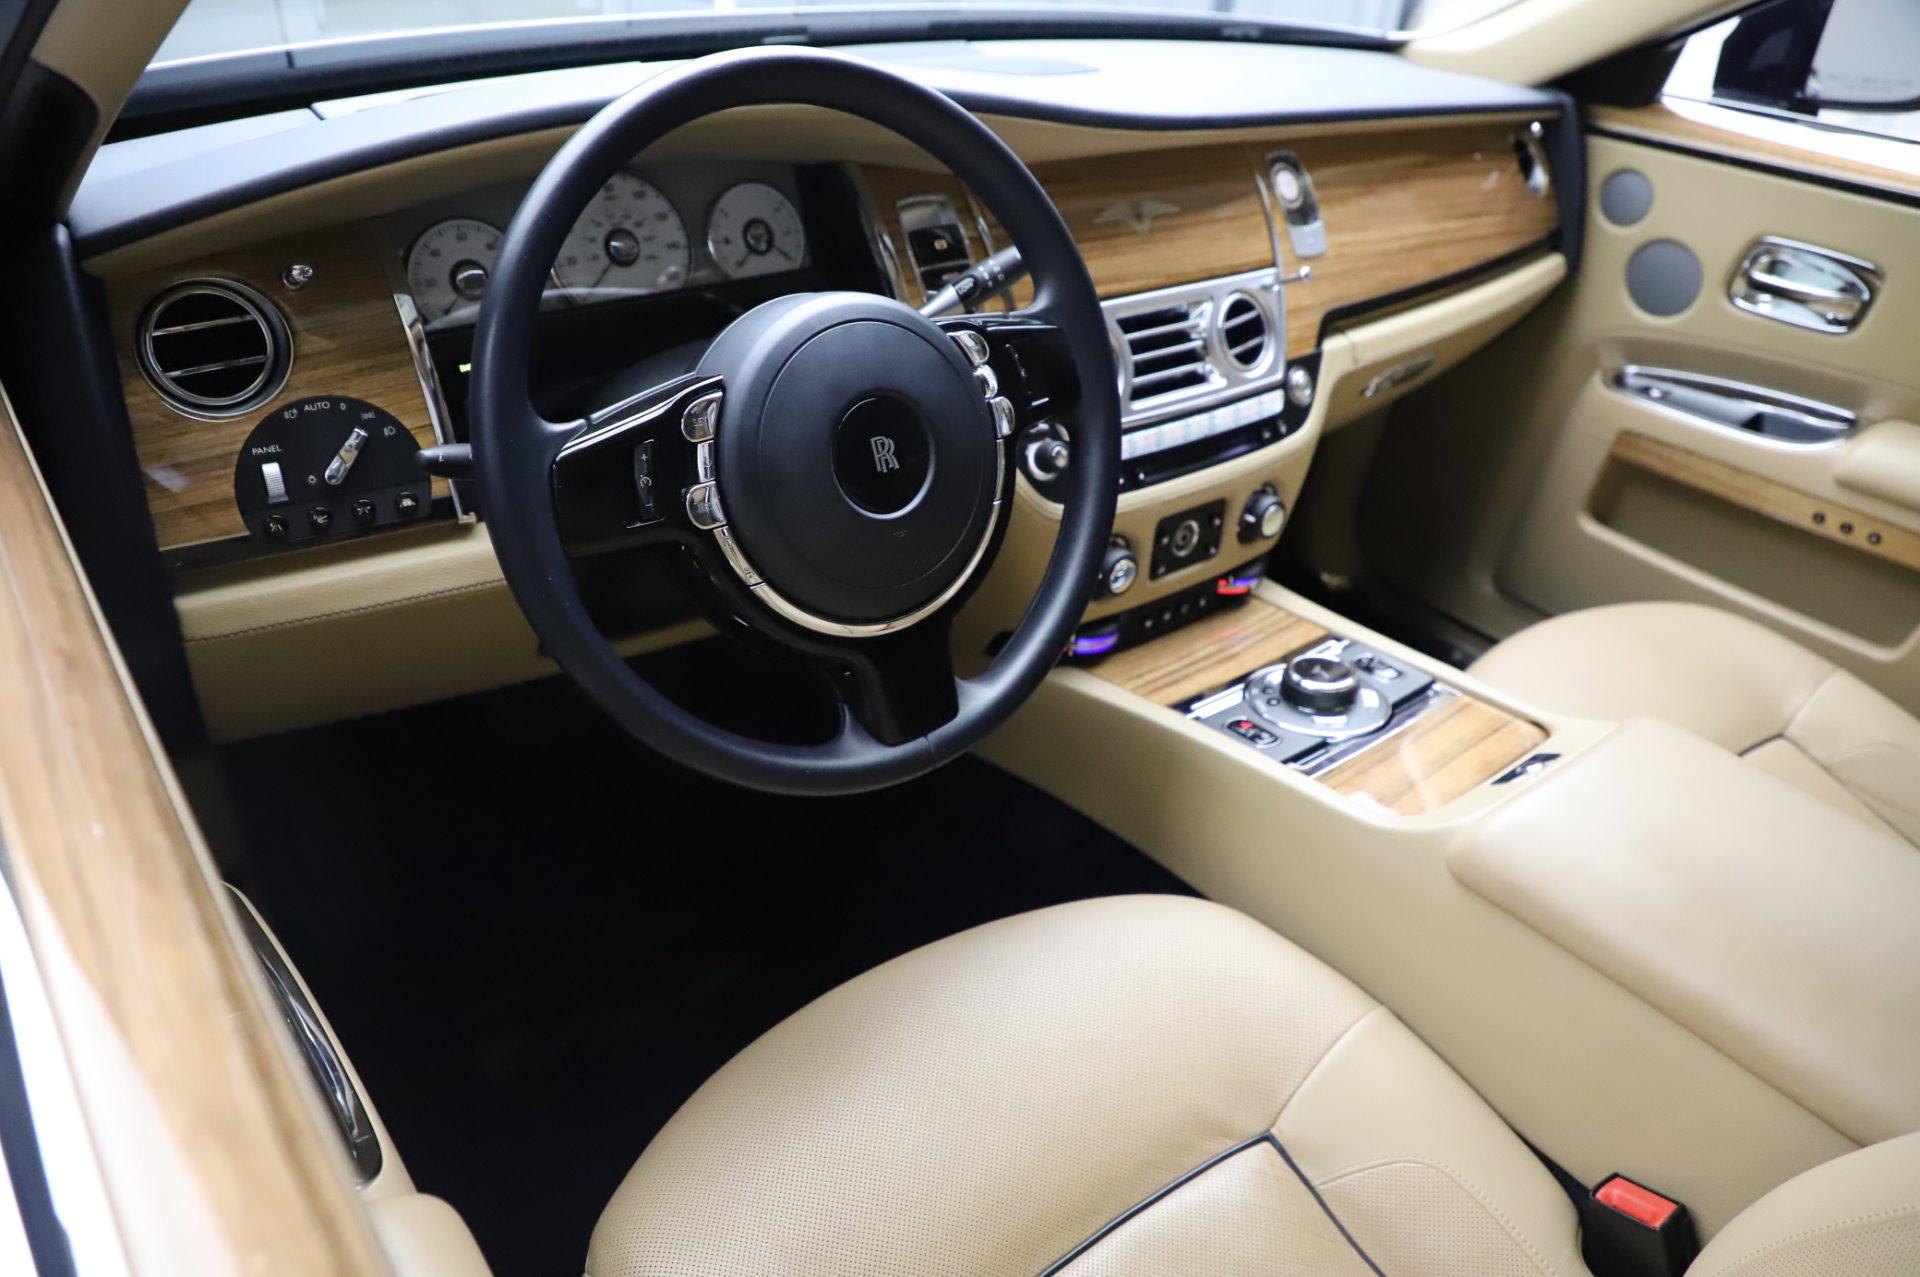 Used 2014 Rolls-Royce Ghost V-Spec For Sale In Westport, CT 858_p11